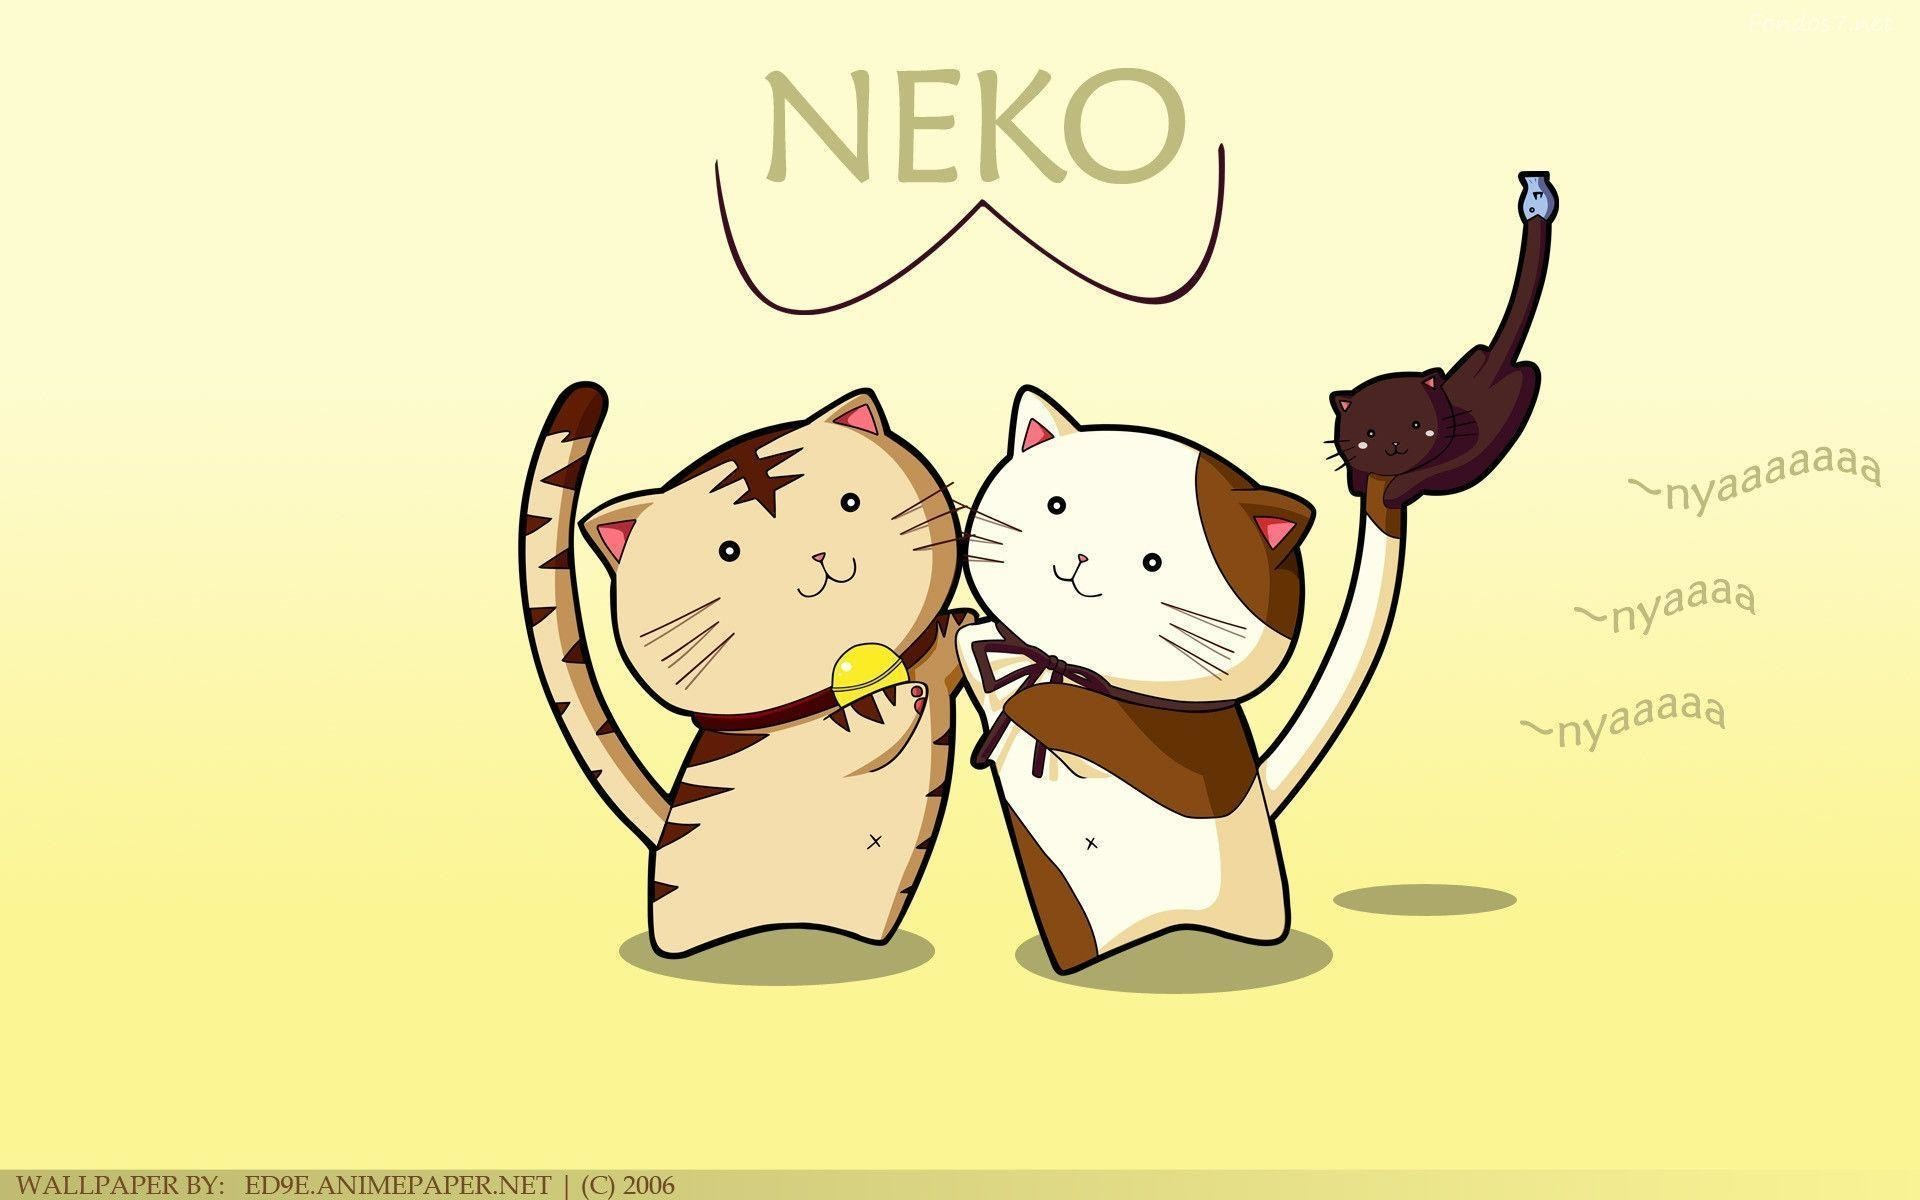 Descargar Fondos de pantalla neko hd widescreen Gratis imagenes #